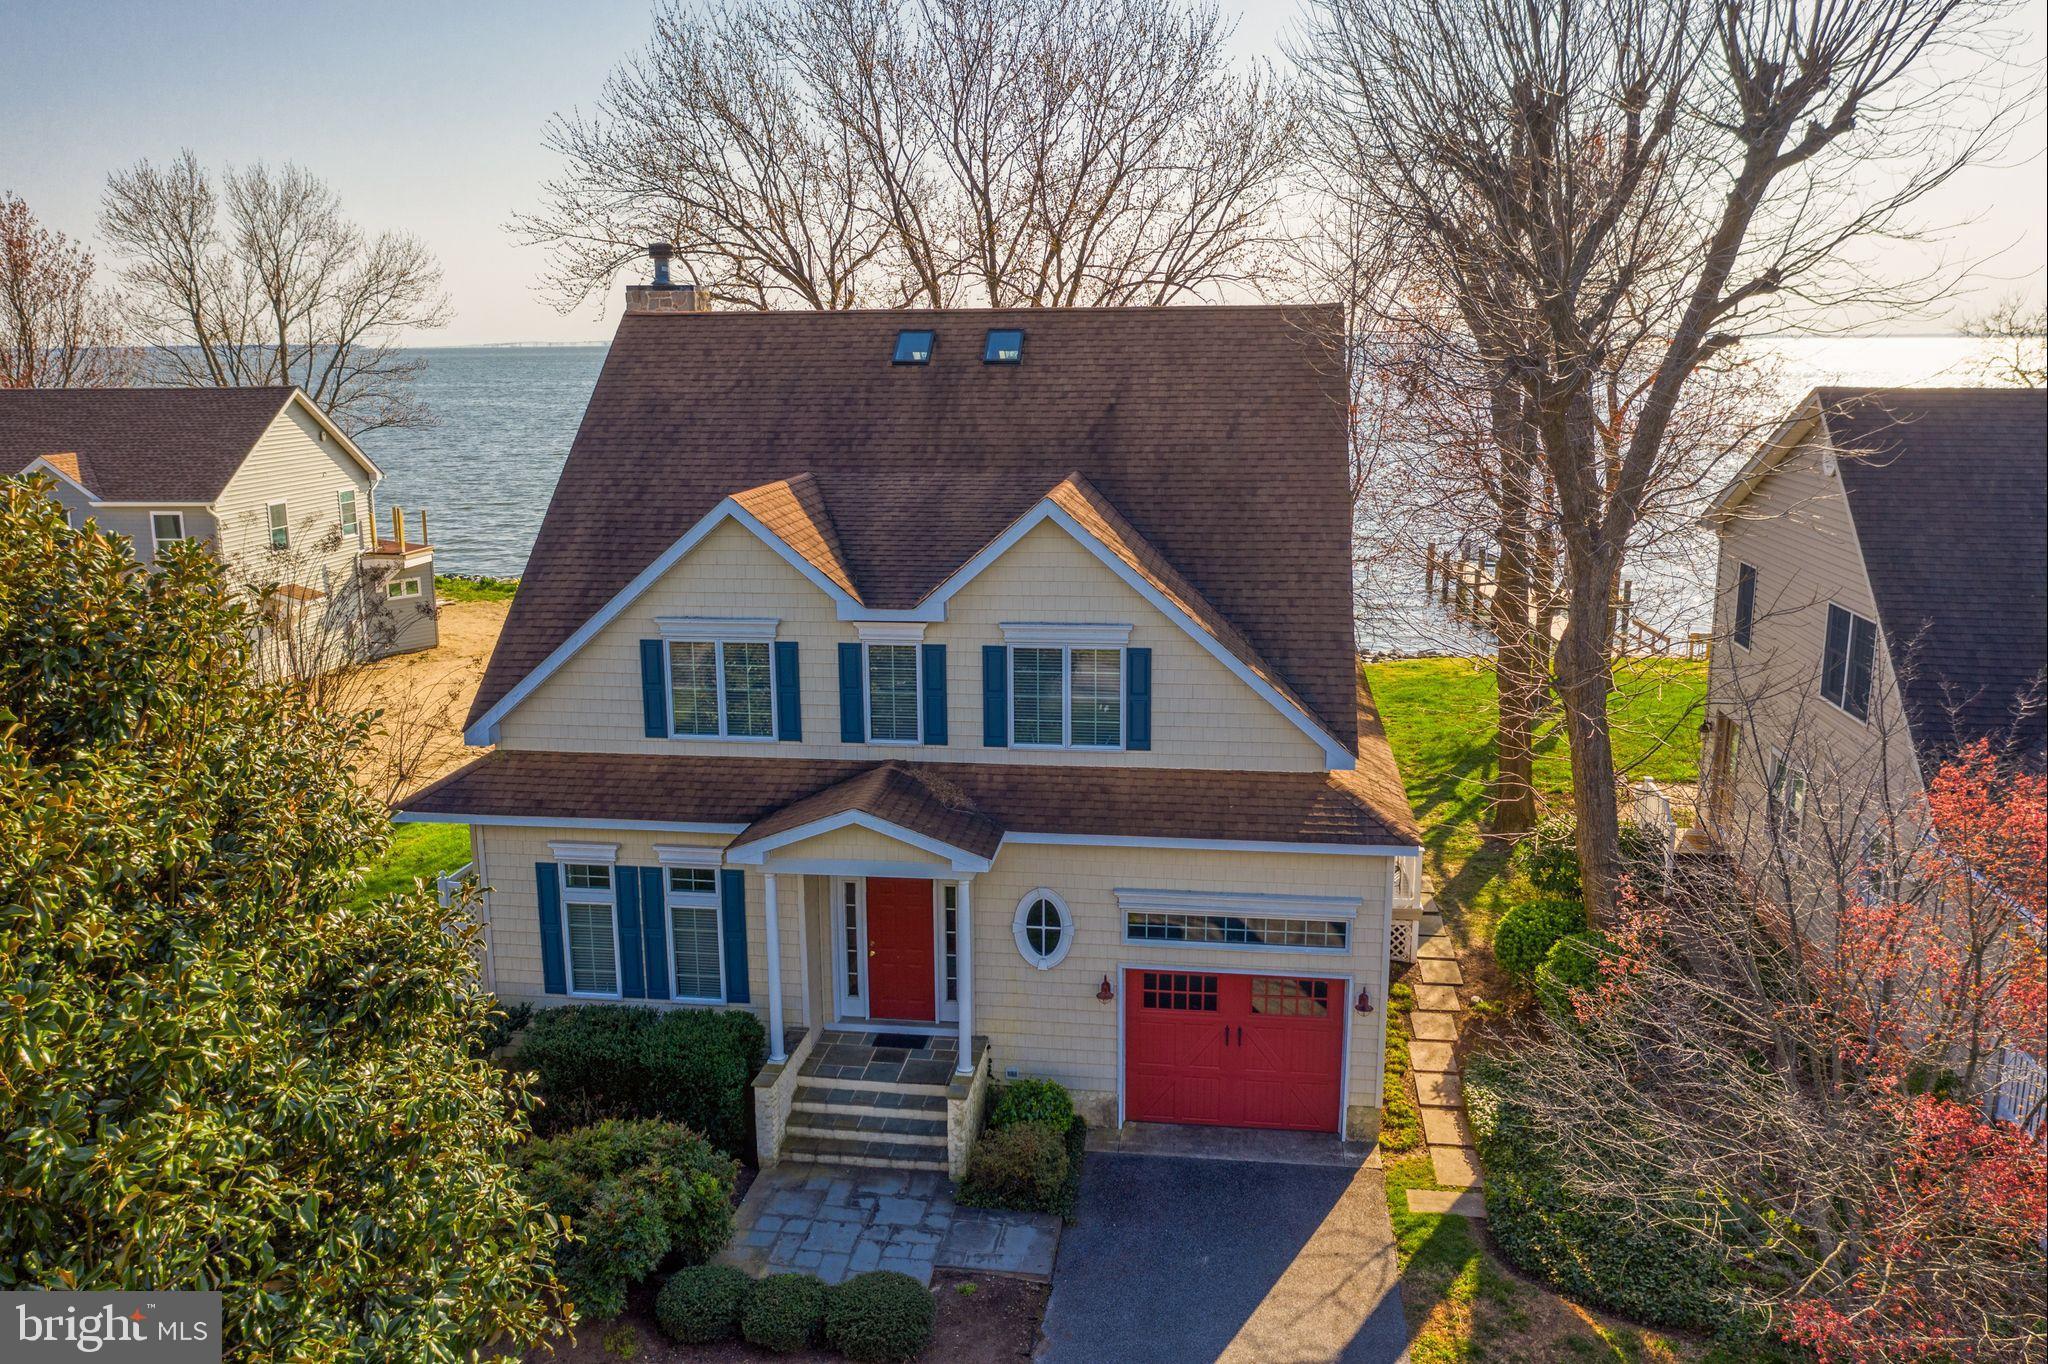 5840 BEACH ROAD, ROCK HALL, Maryland 21661, 4 Bedrooms Bedrooms, ,3 BathroomsBathrooms,Single Family,For Sale,5840 BEACH ROAD,MDKE117932